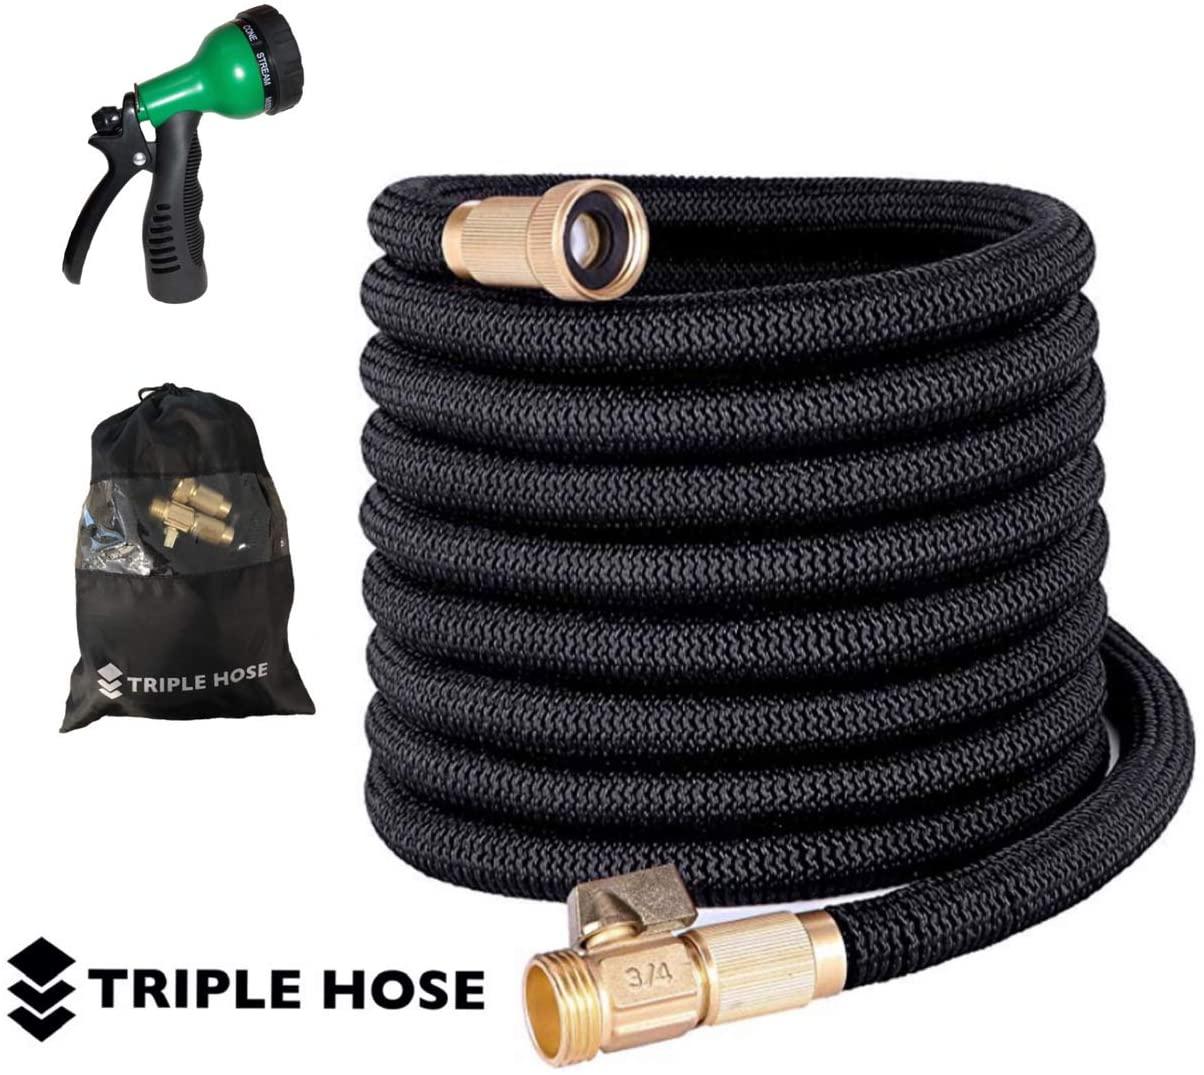 "Triple Hose Garden Hose | Strongest Expandable Hose Triple Layer Latex Core | ¾"" Solid Brass Shut Off Valve | Heavy Duty Nylon Outer Cover | Flexible Expanding Hose | Storage | Gift Bag (100, Black)"